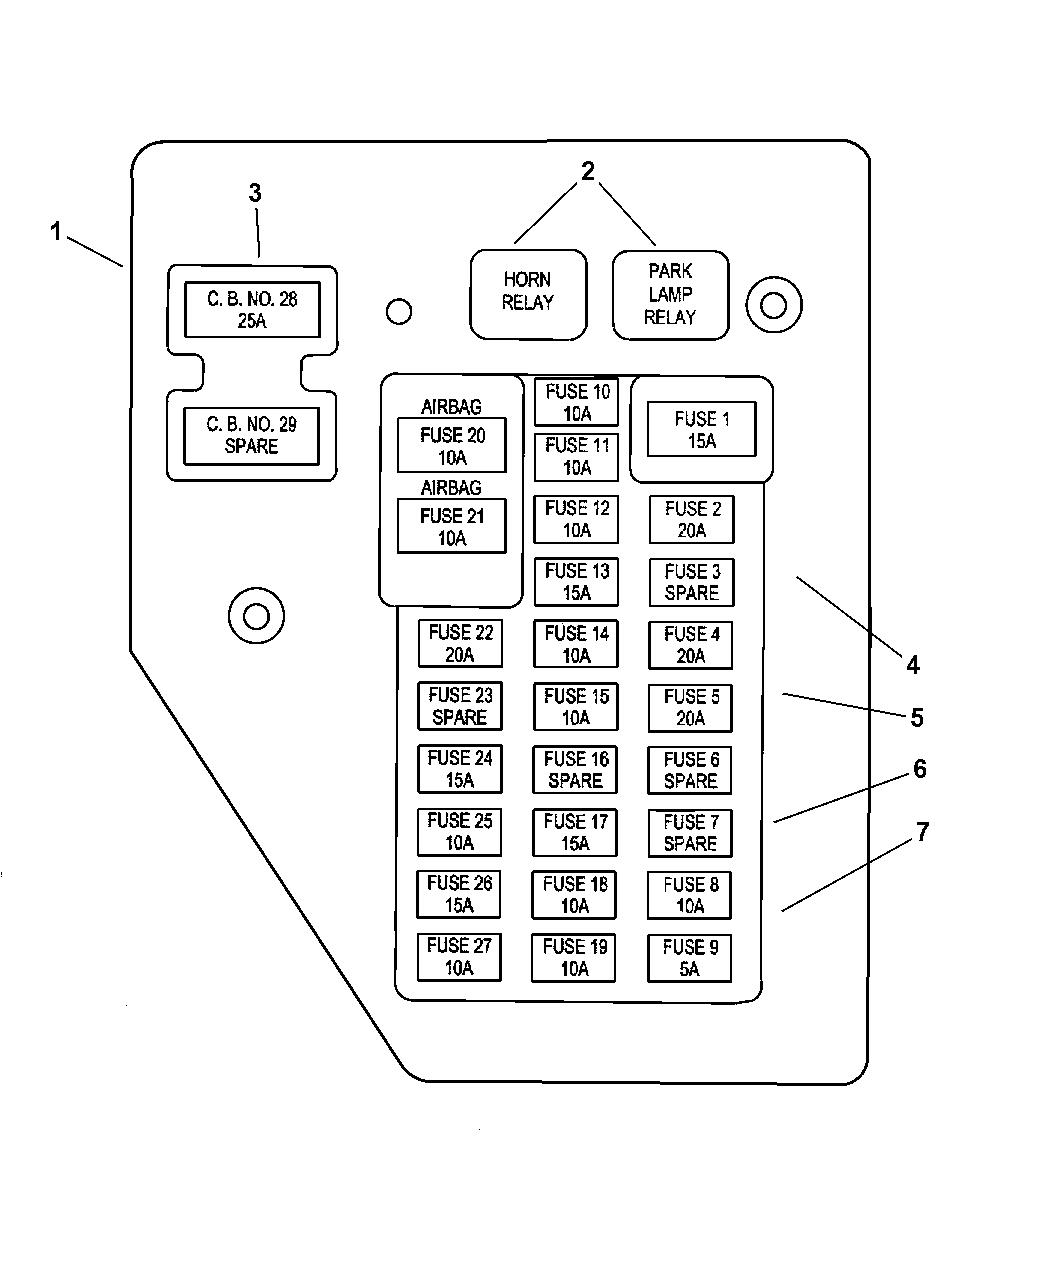 2004 Dodge Durango Fuse Box Layout - Wiring Diagram